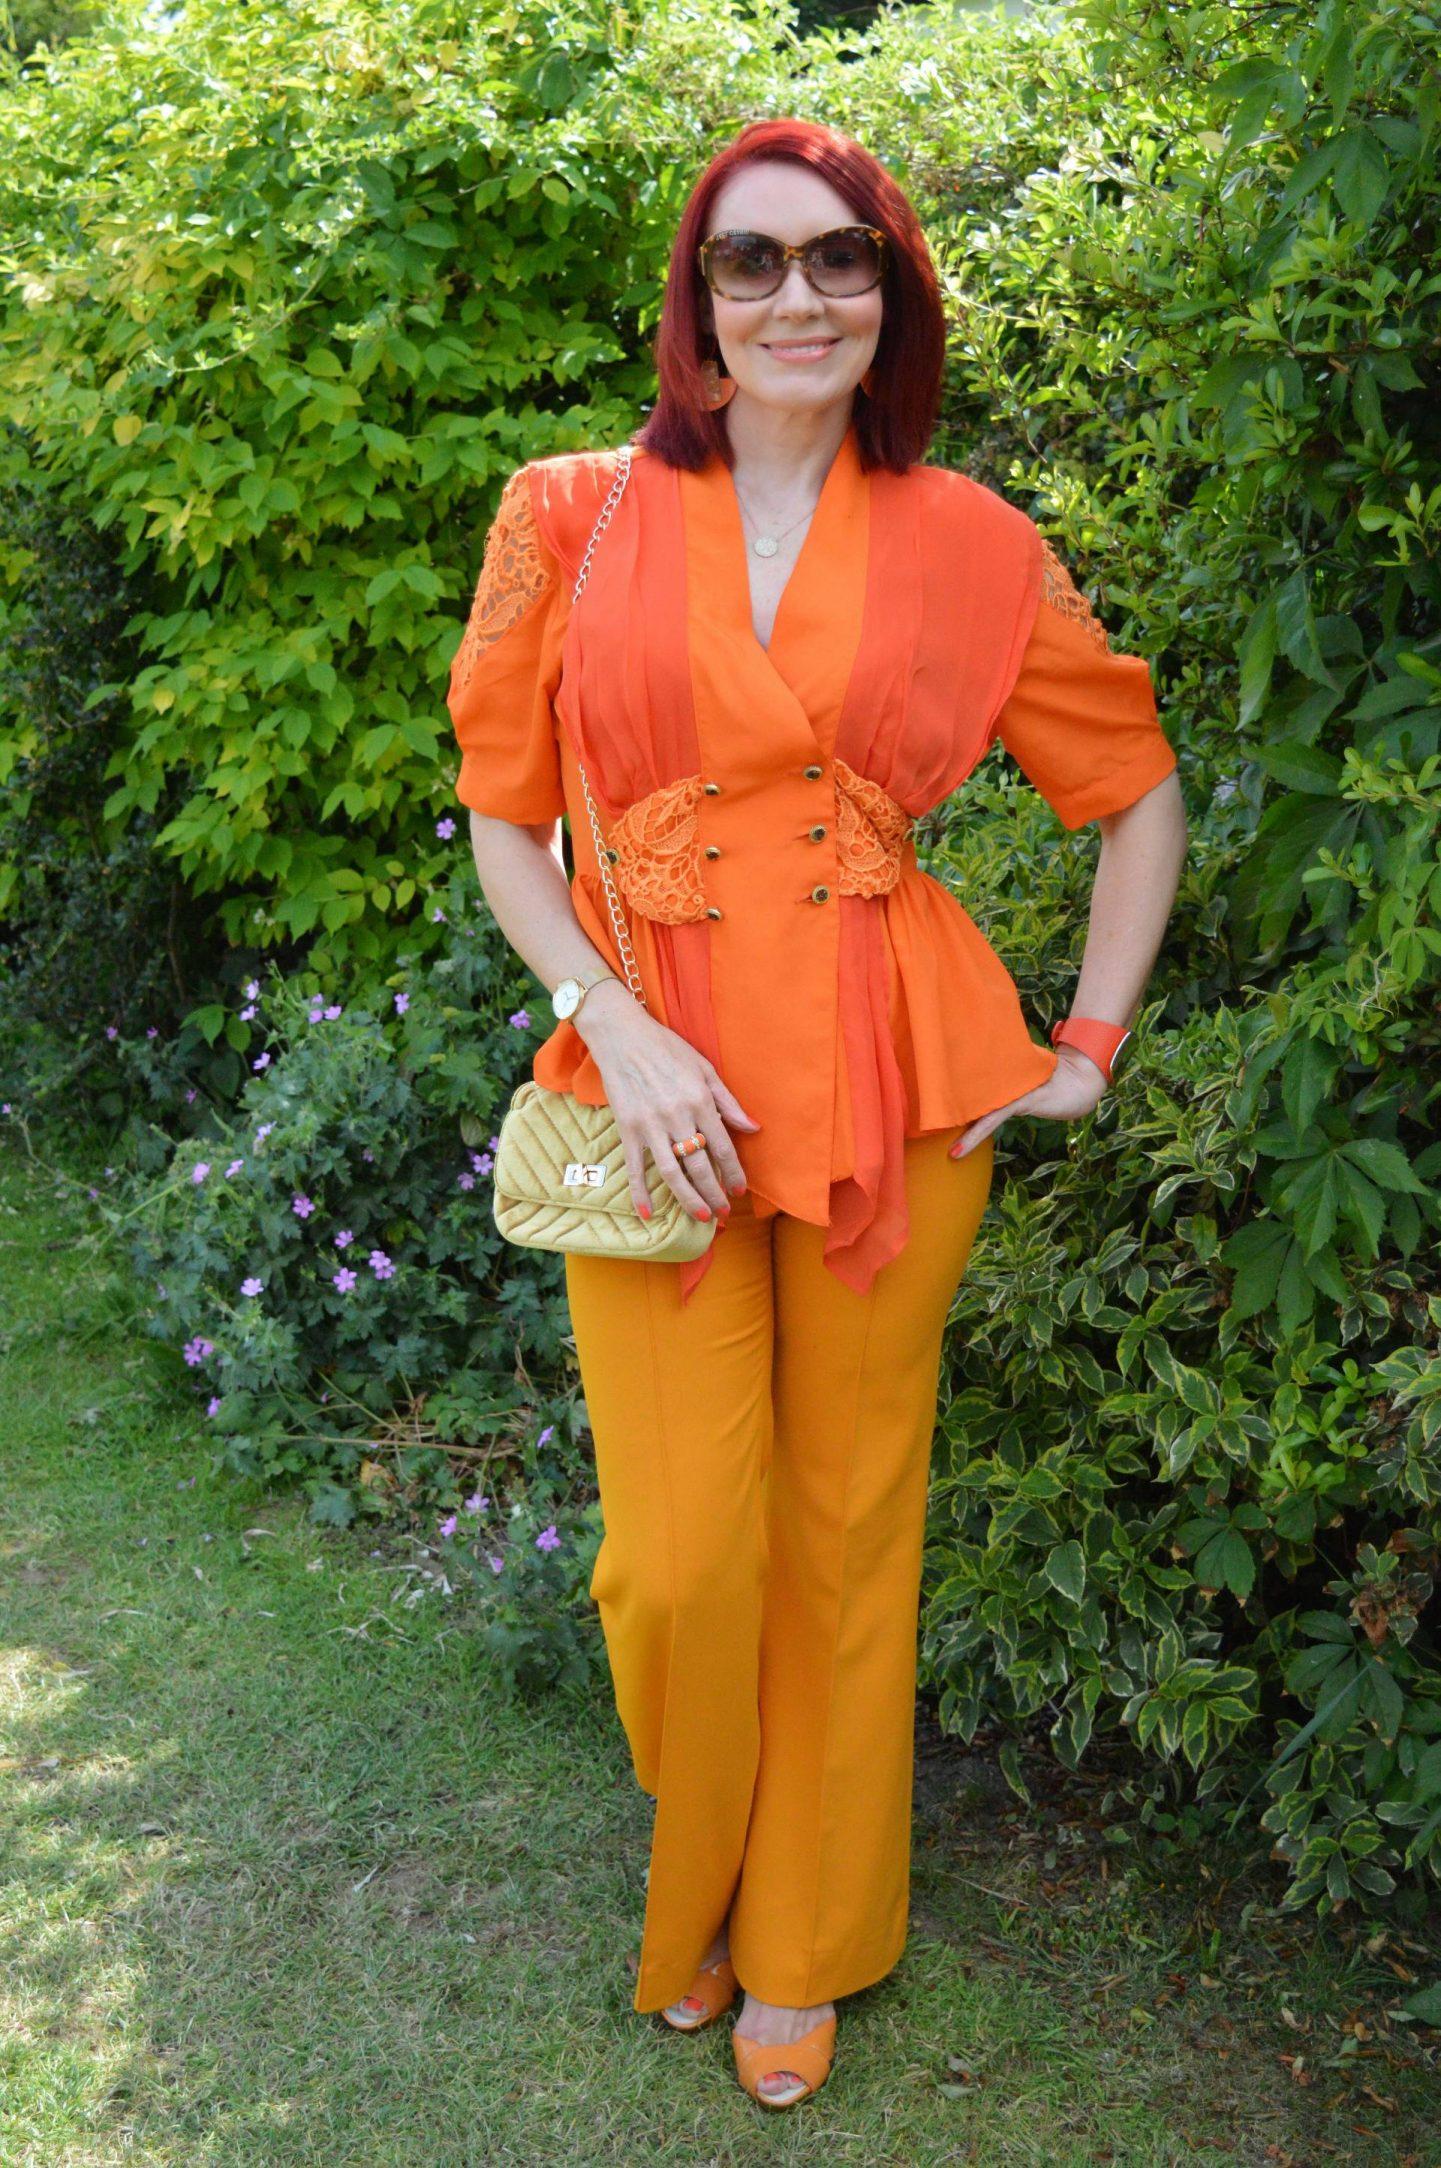 Orange Crush, vintage orange blouse, Zara orange trousers, Miss Sixty orange sandals